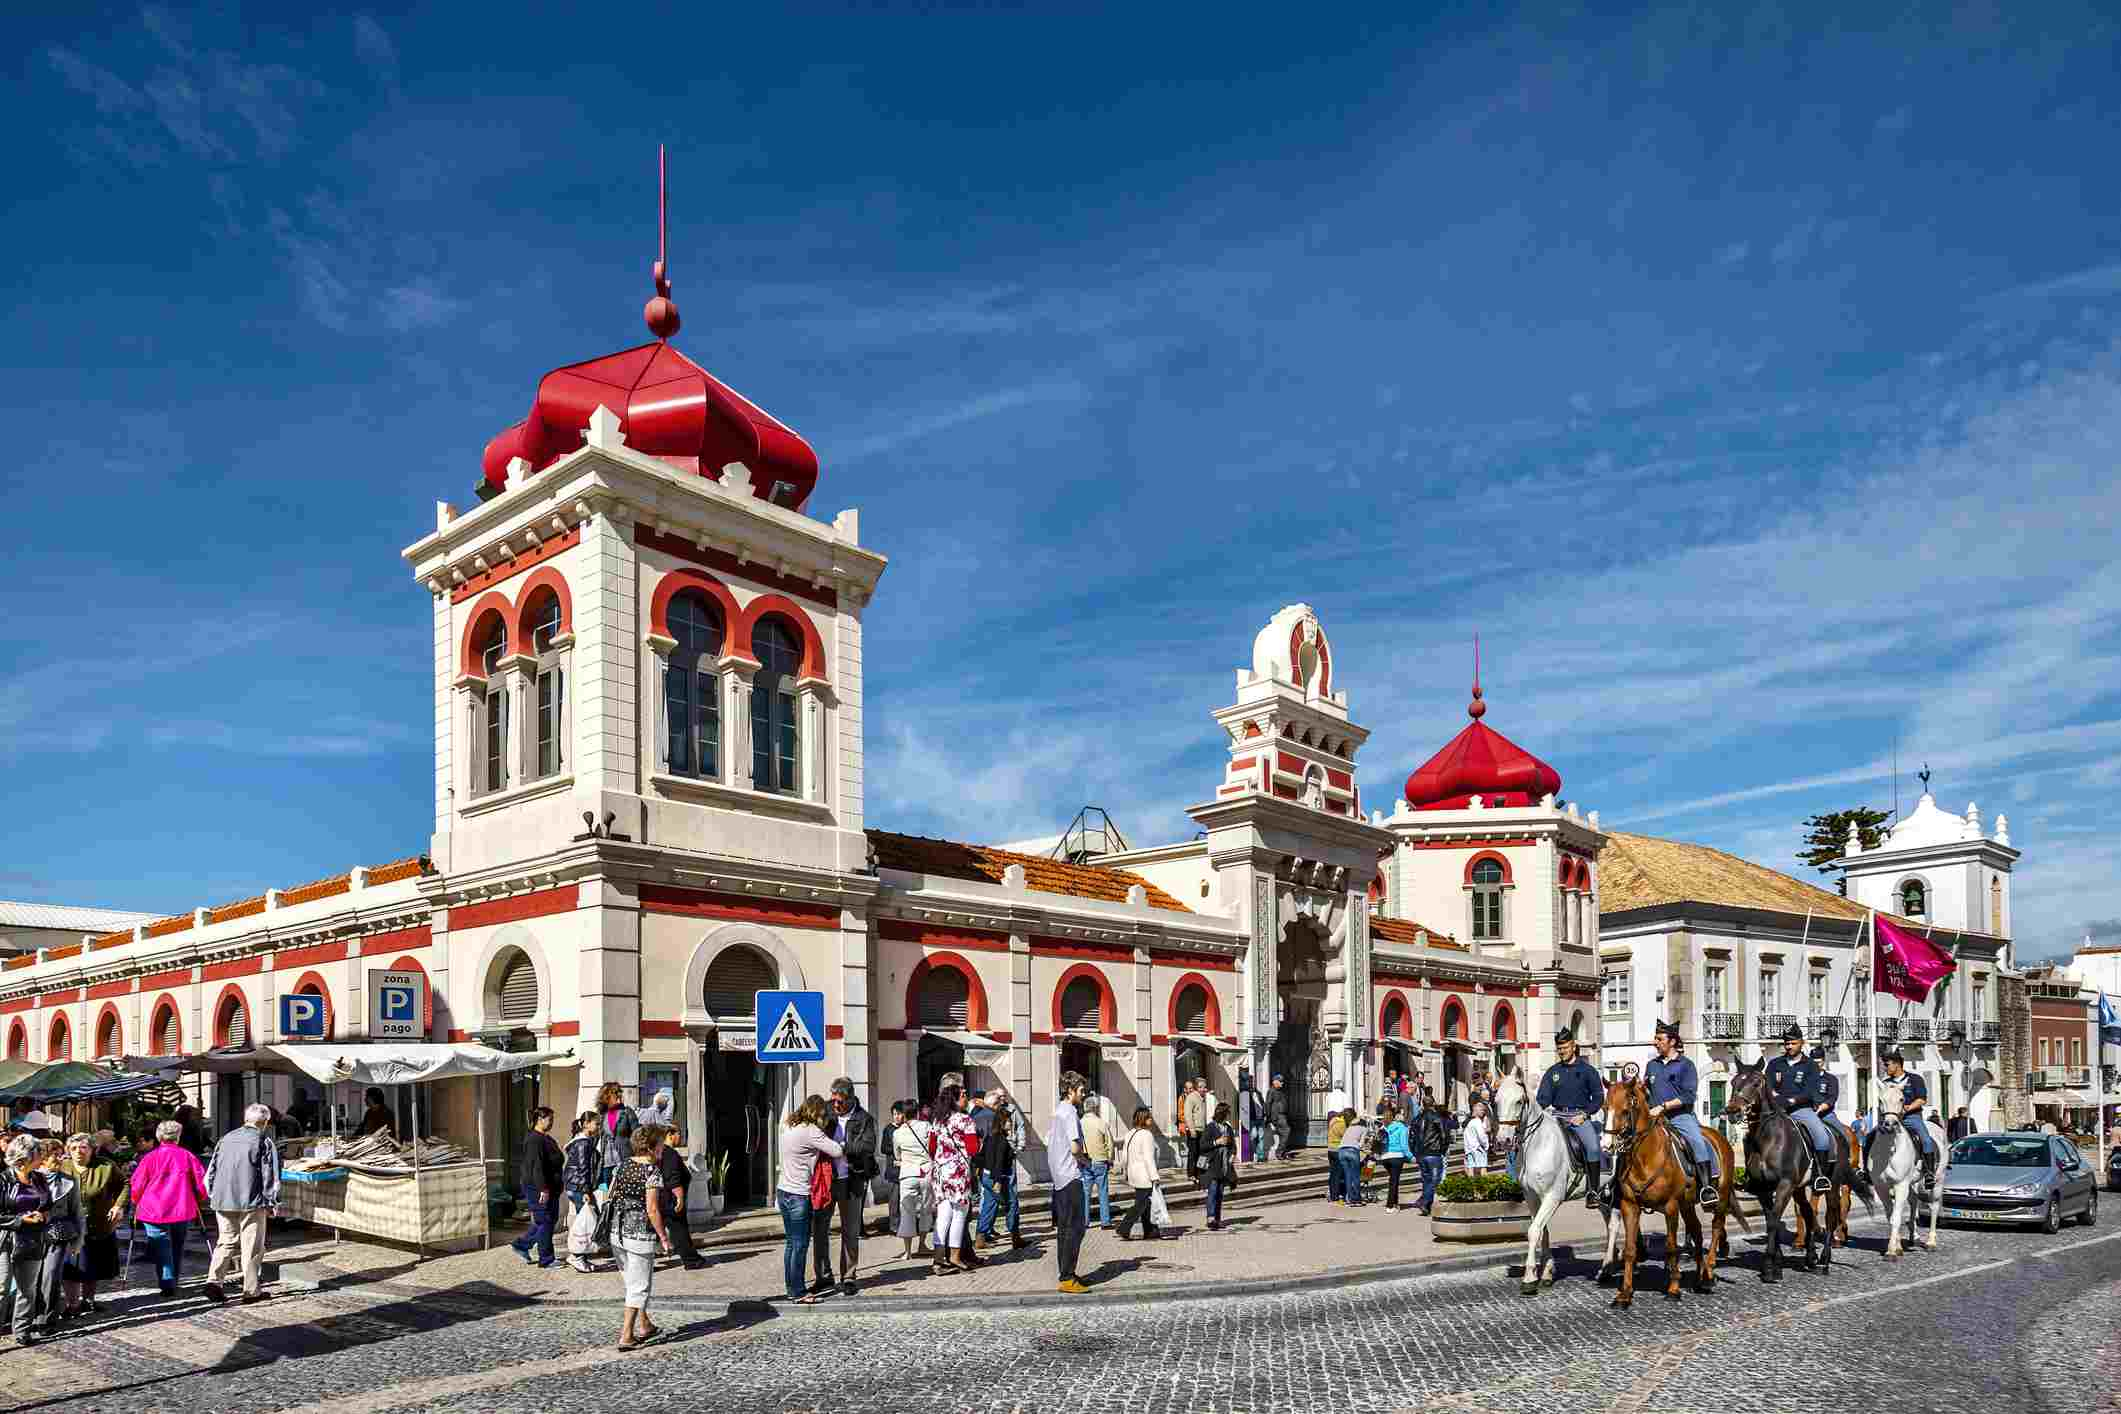 Market hall, Loule, Algarve, Portugal